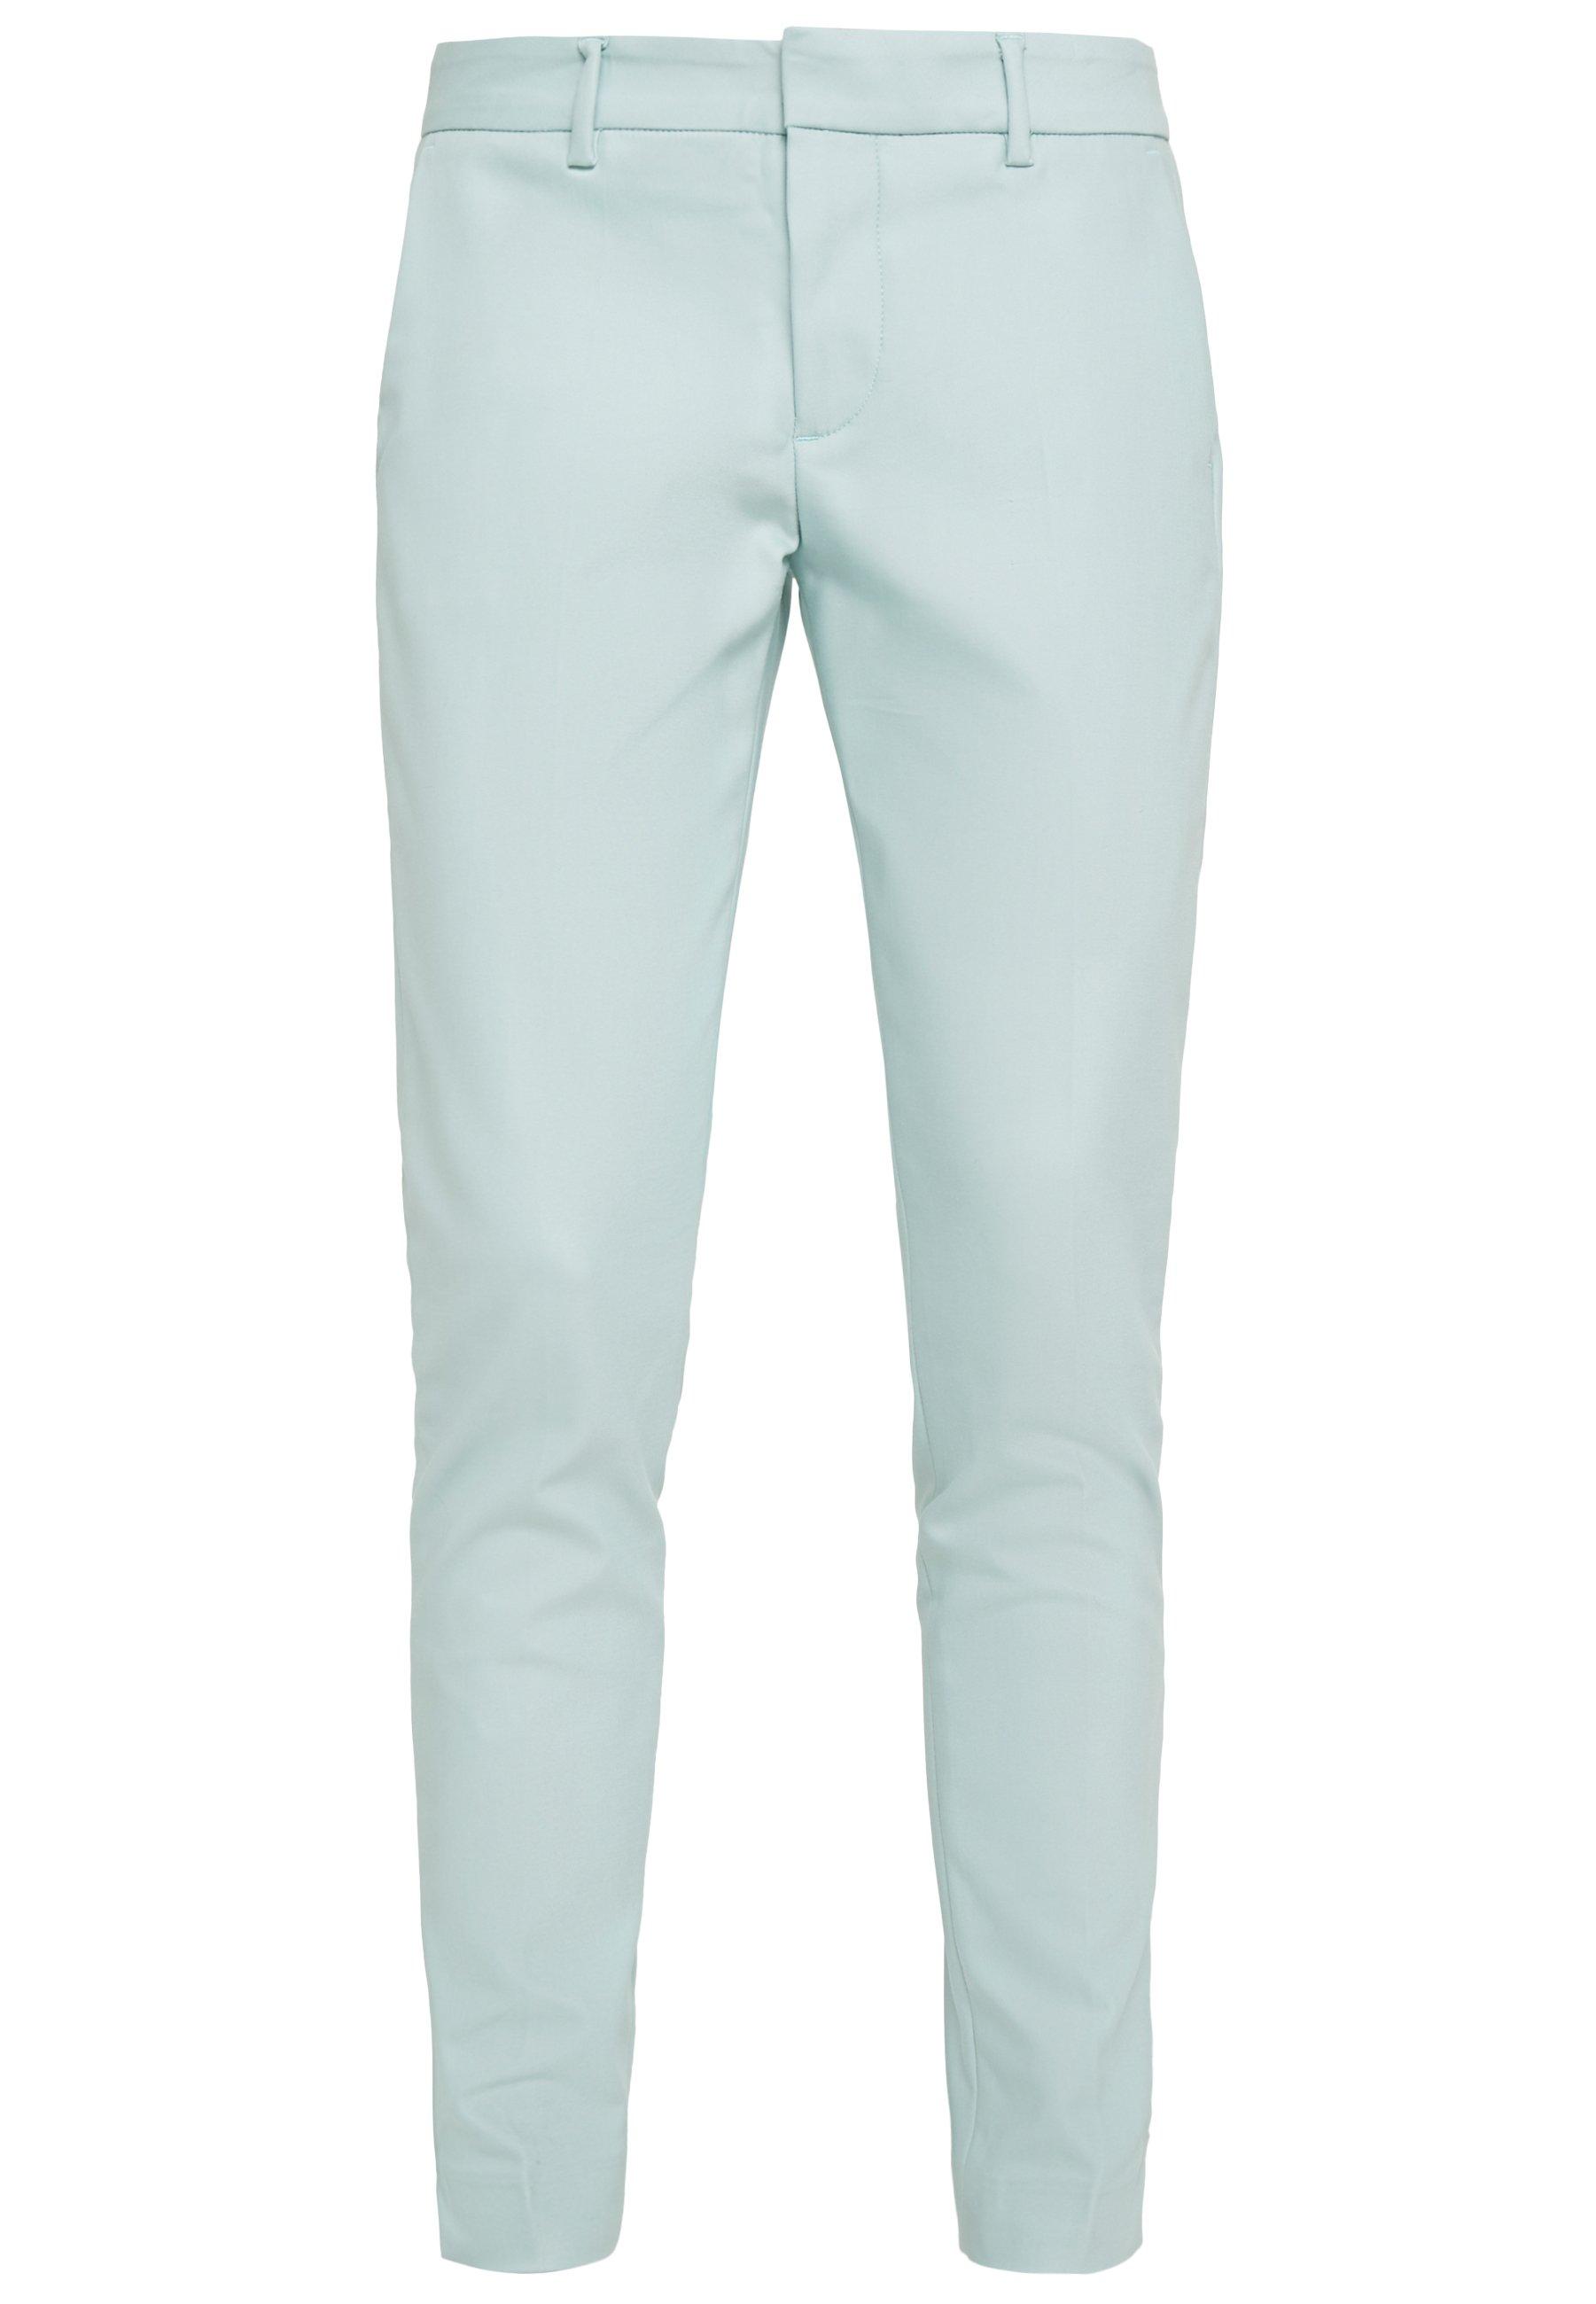 Mos Mosh Abbey Night Pant Sustainable - Pantaloni Antracite 0exlF